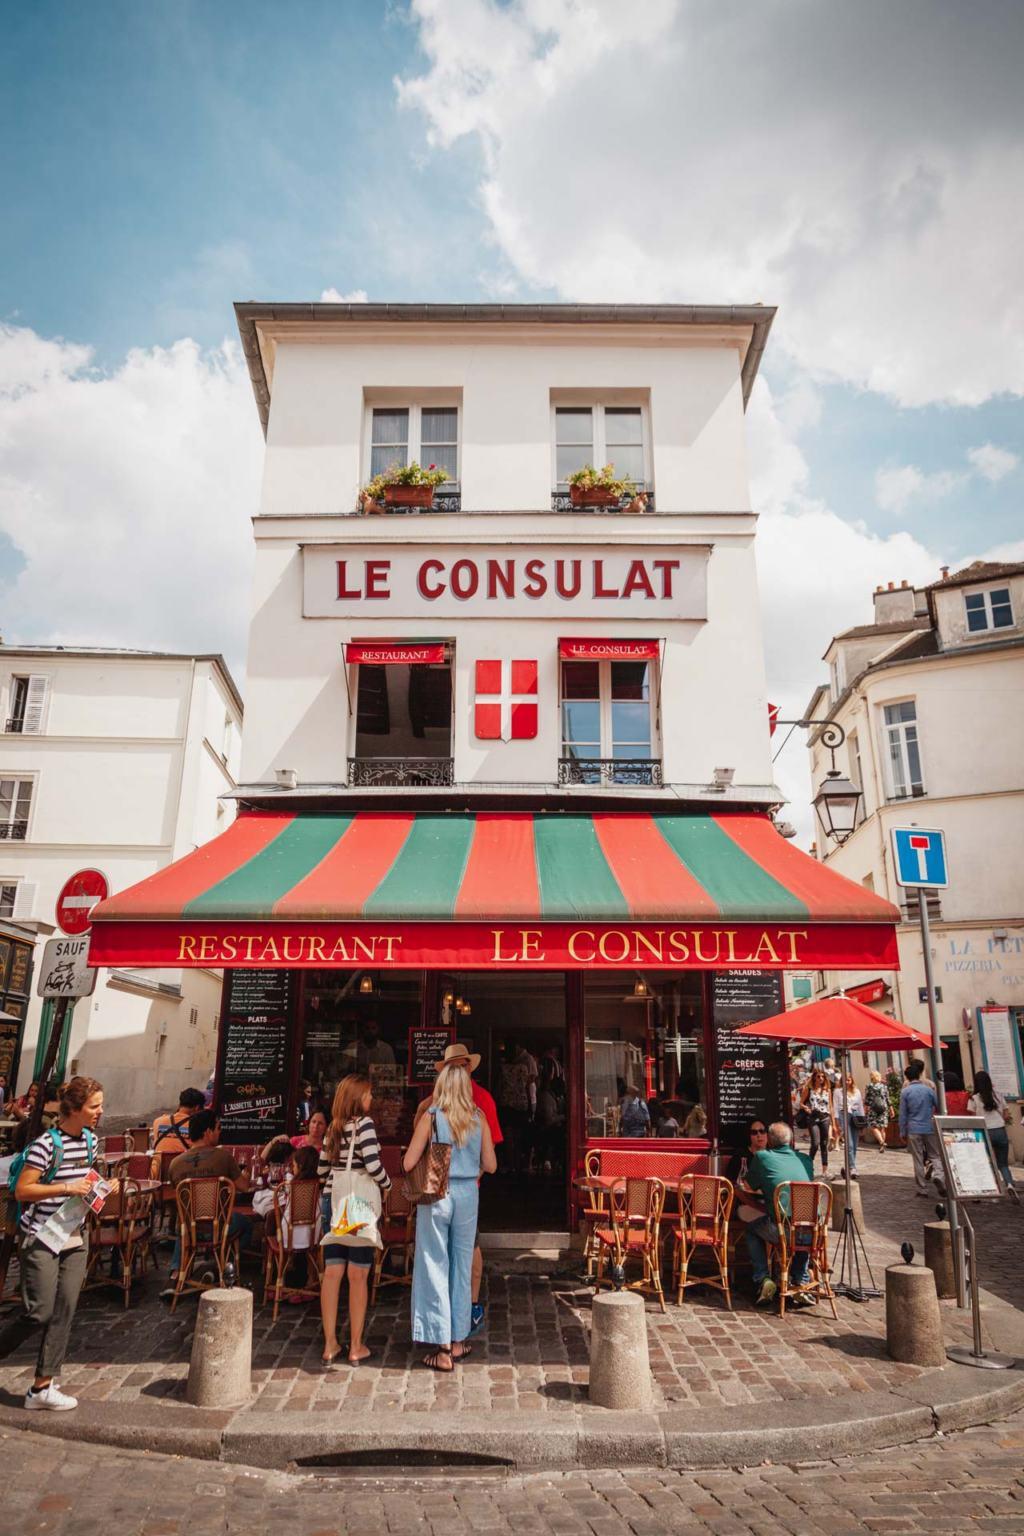 Le Consulat, Montmartre, Paris Instagram